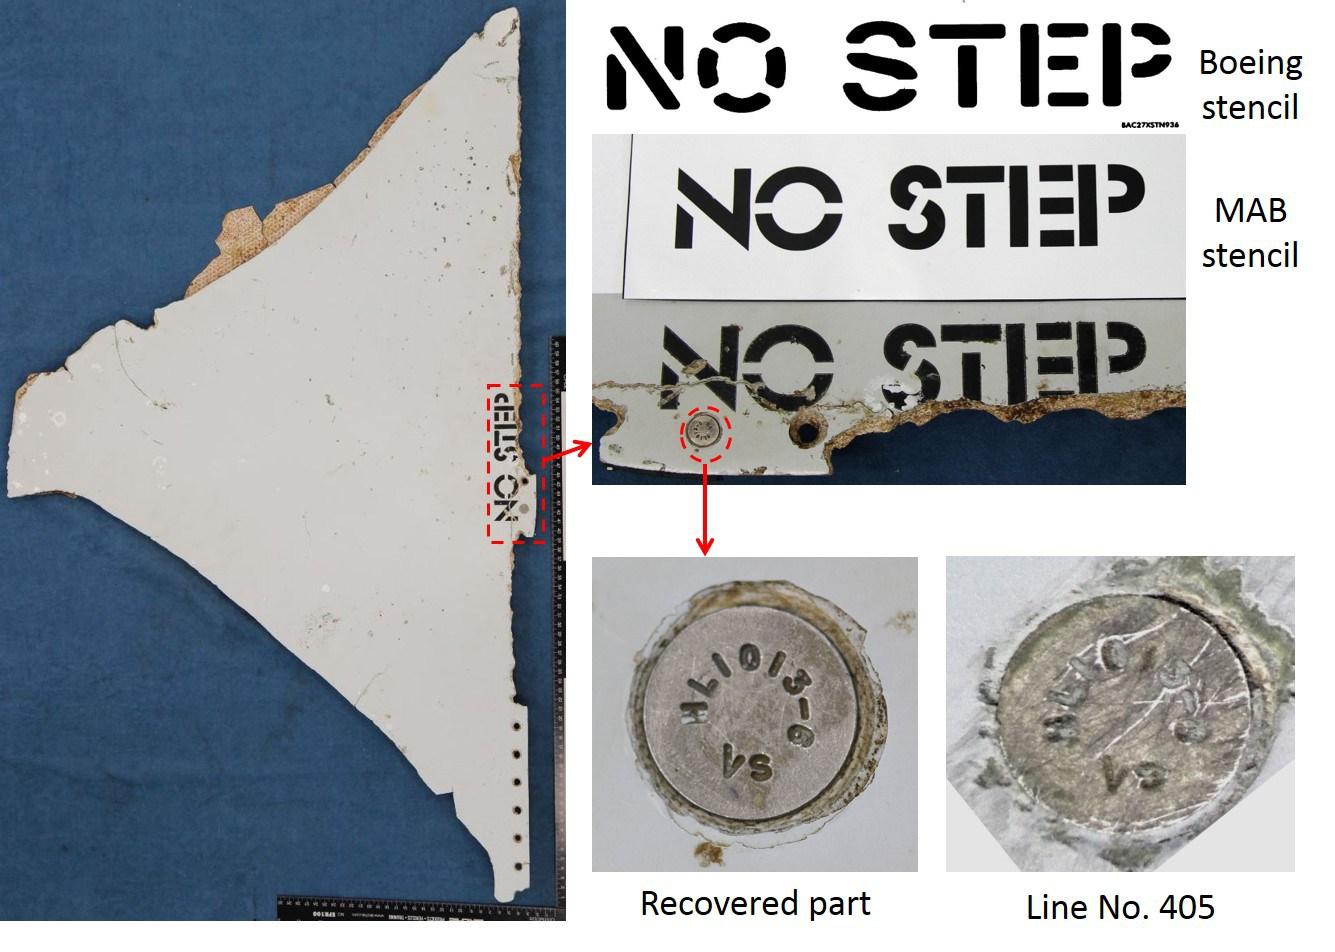 rid21-stab-evidence_03.jpg